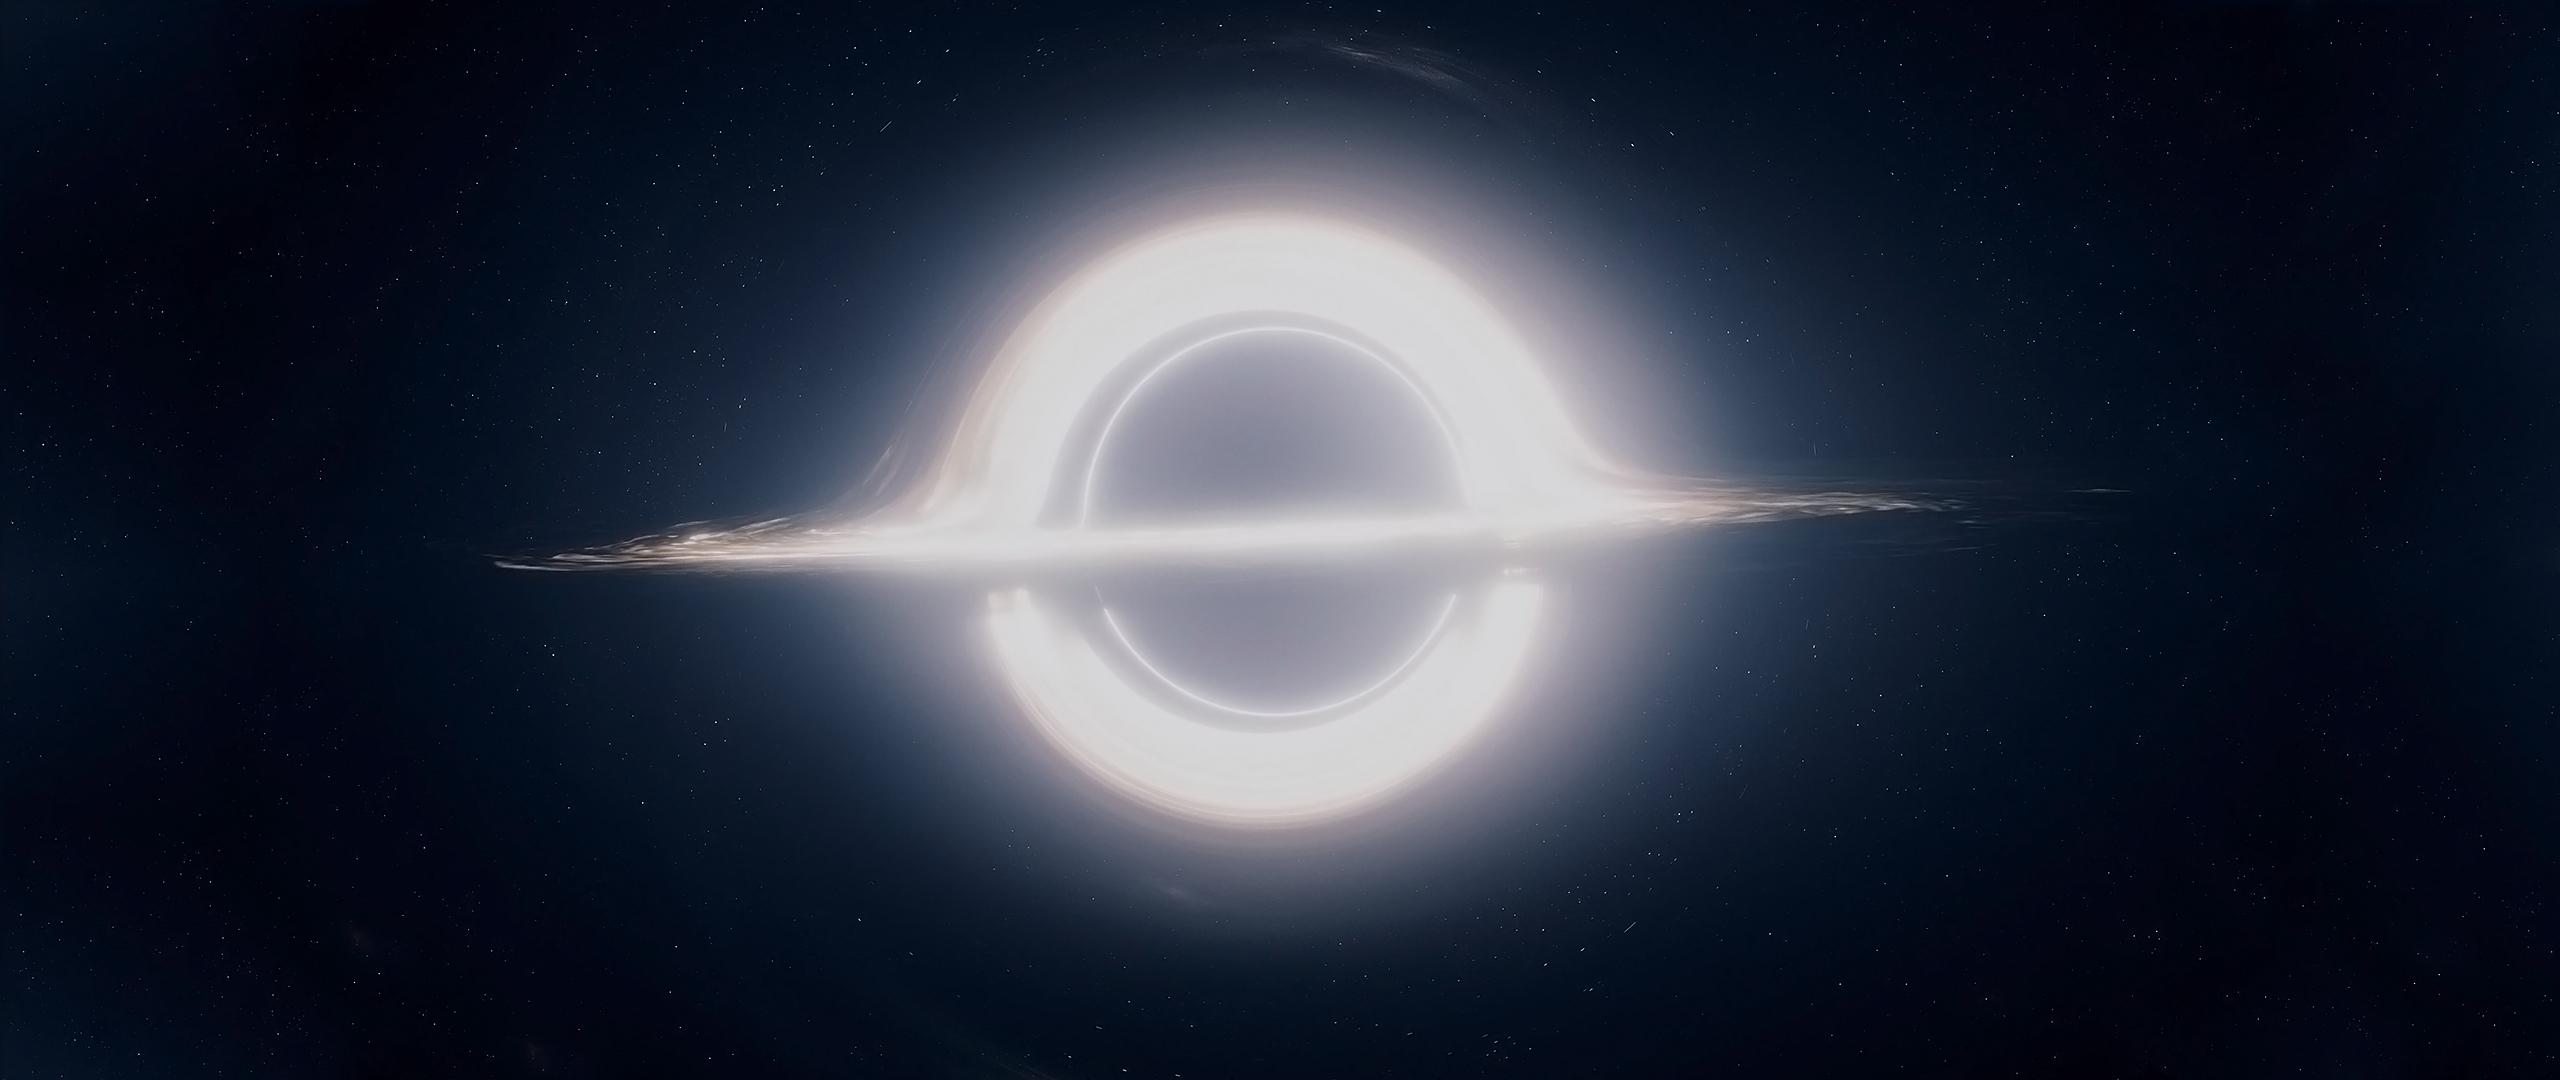 Interstellar Black Hole Wallpaper by ABAthedude 2560x1080